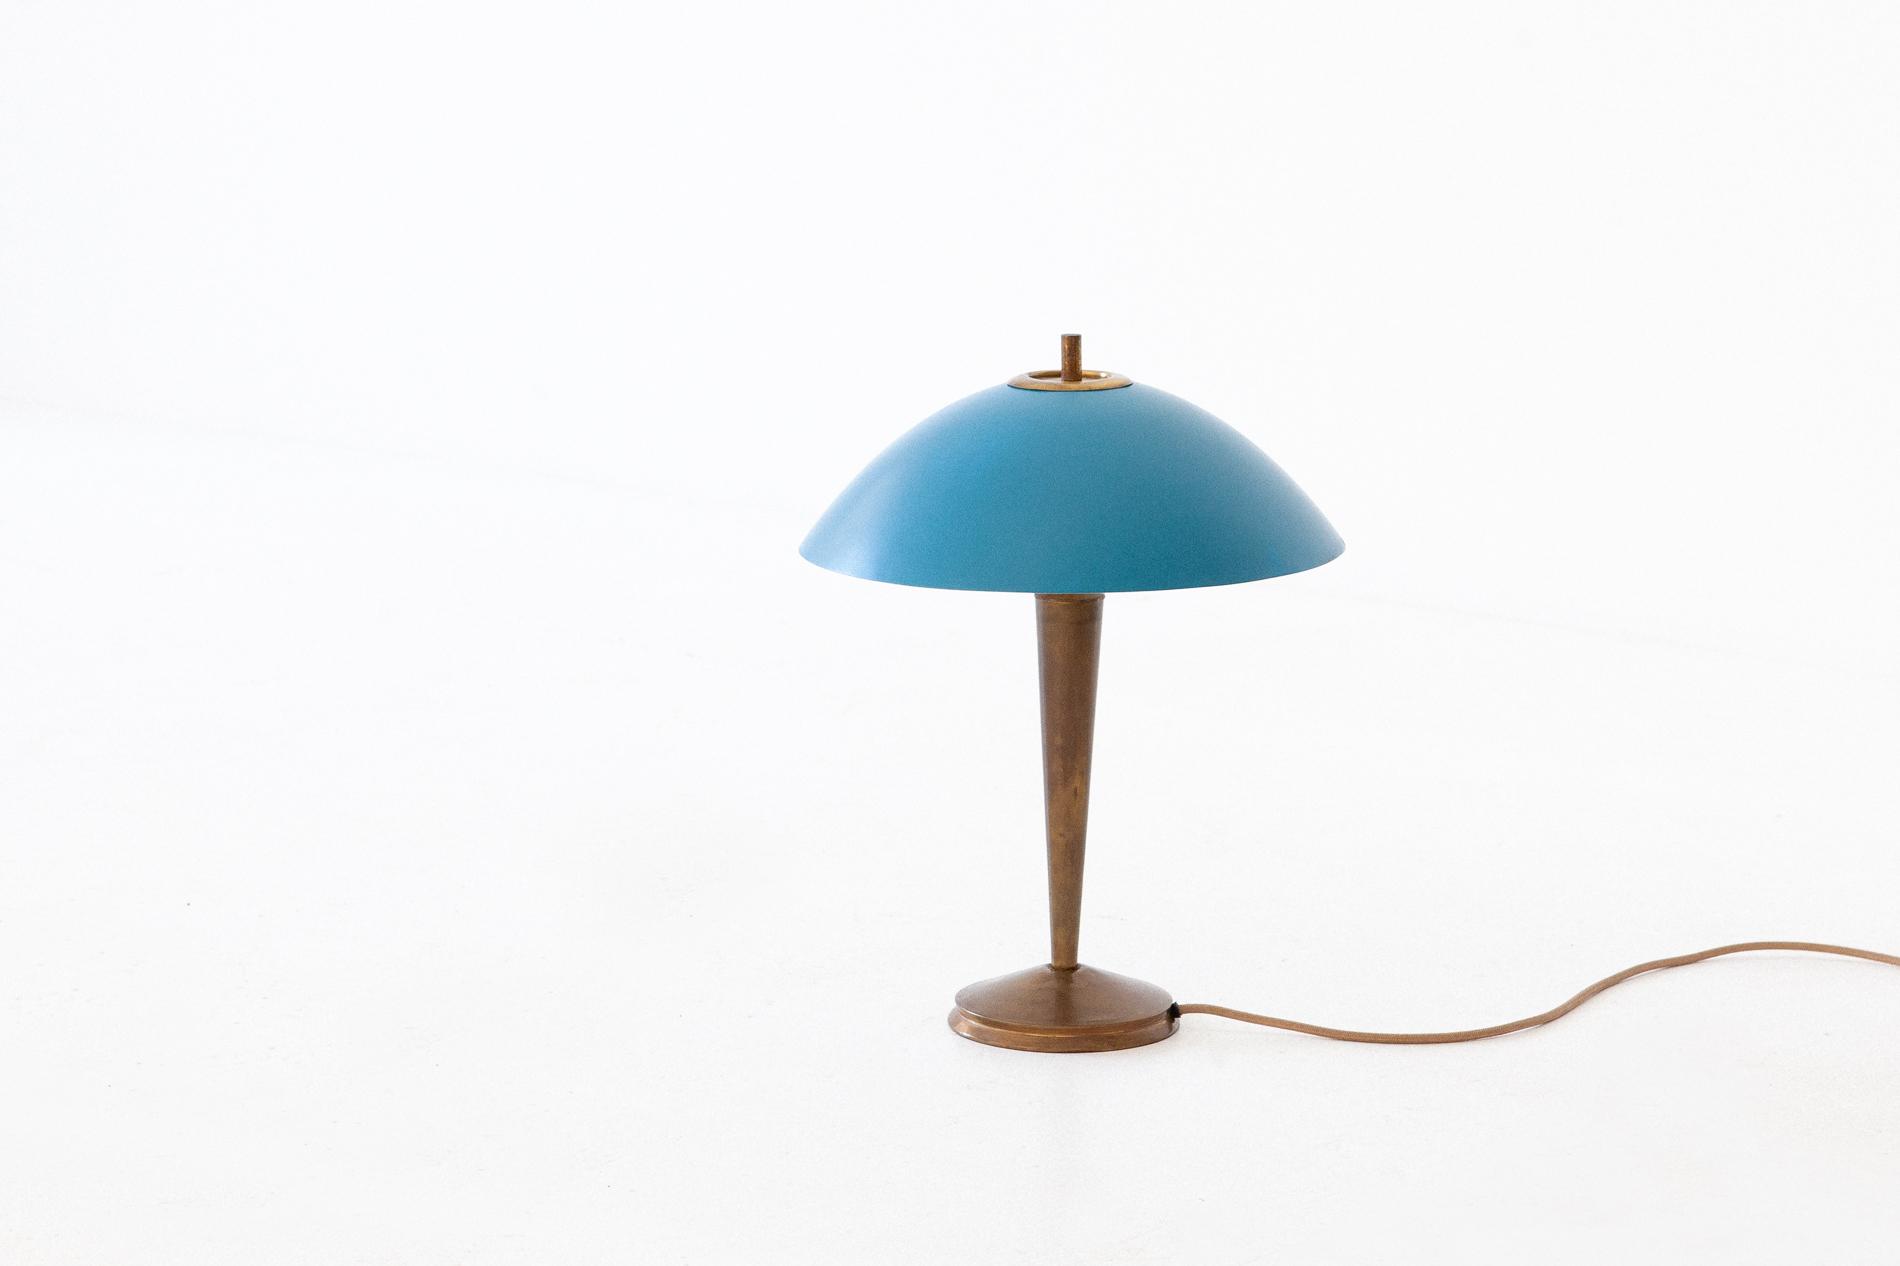 1950s-italian-blue-brass-table-lamp-4-L78